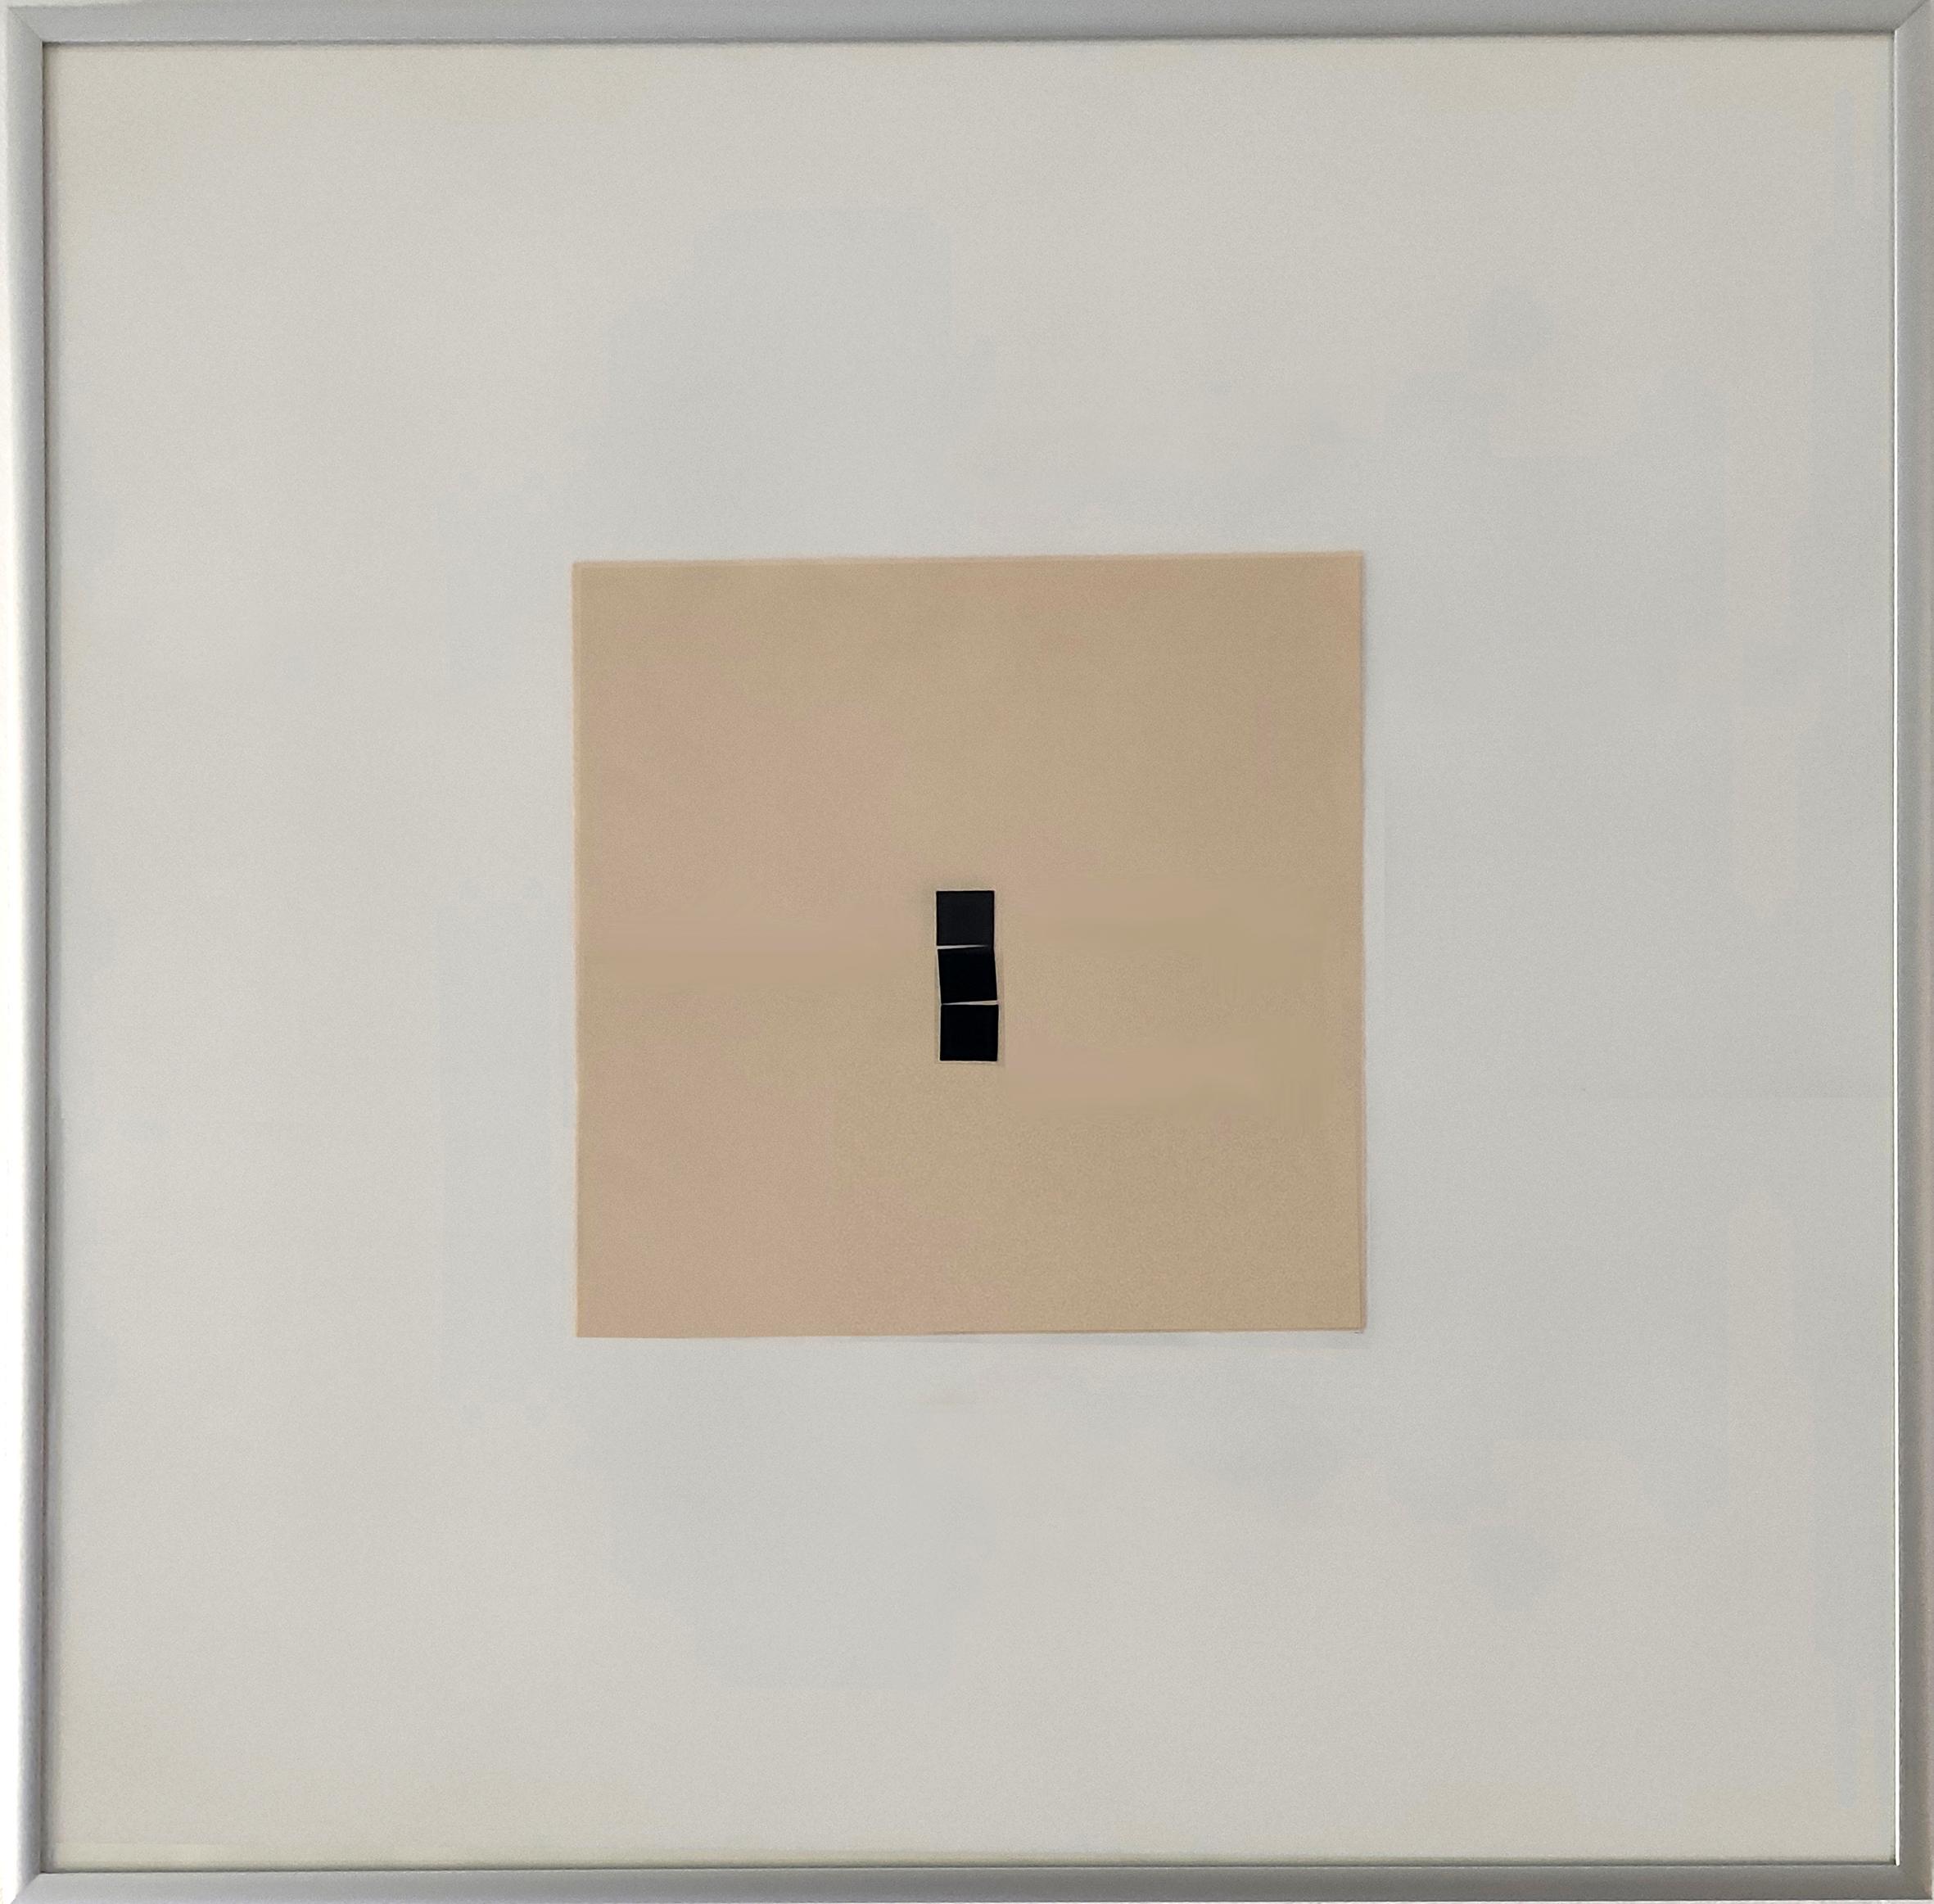 Diet Sayler, Capriccio 1982:03:23, Collage auf Bütten, 21x21 cm | Alu 50x50 cm